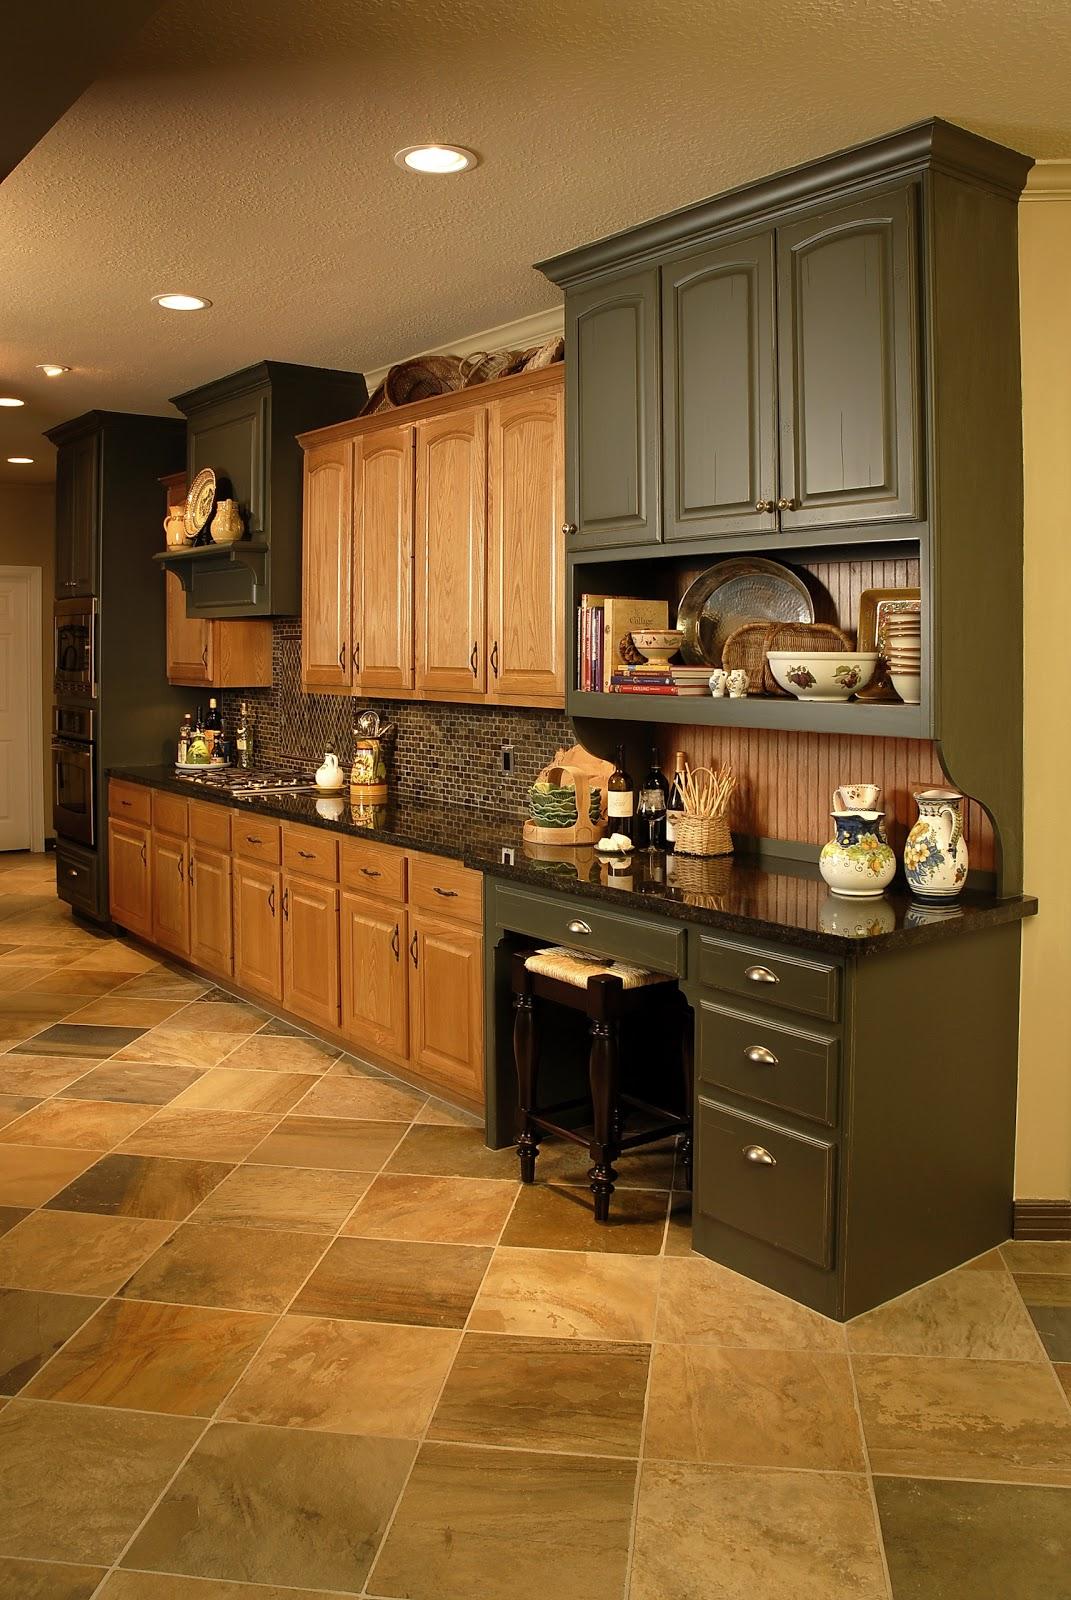 Kitchen remodel pictures dark cabinets. dark granite countertops ...